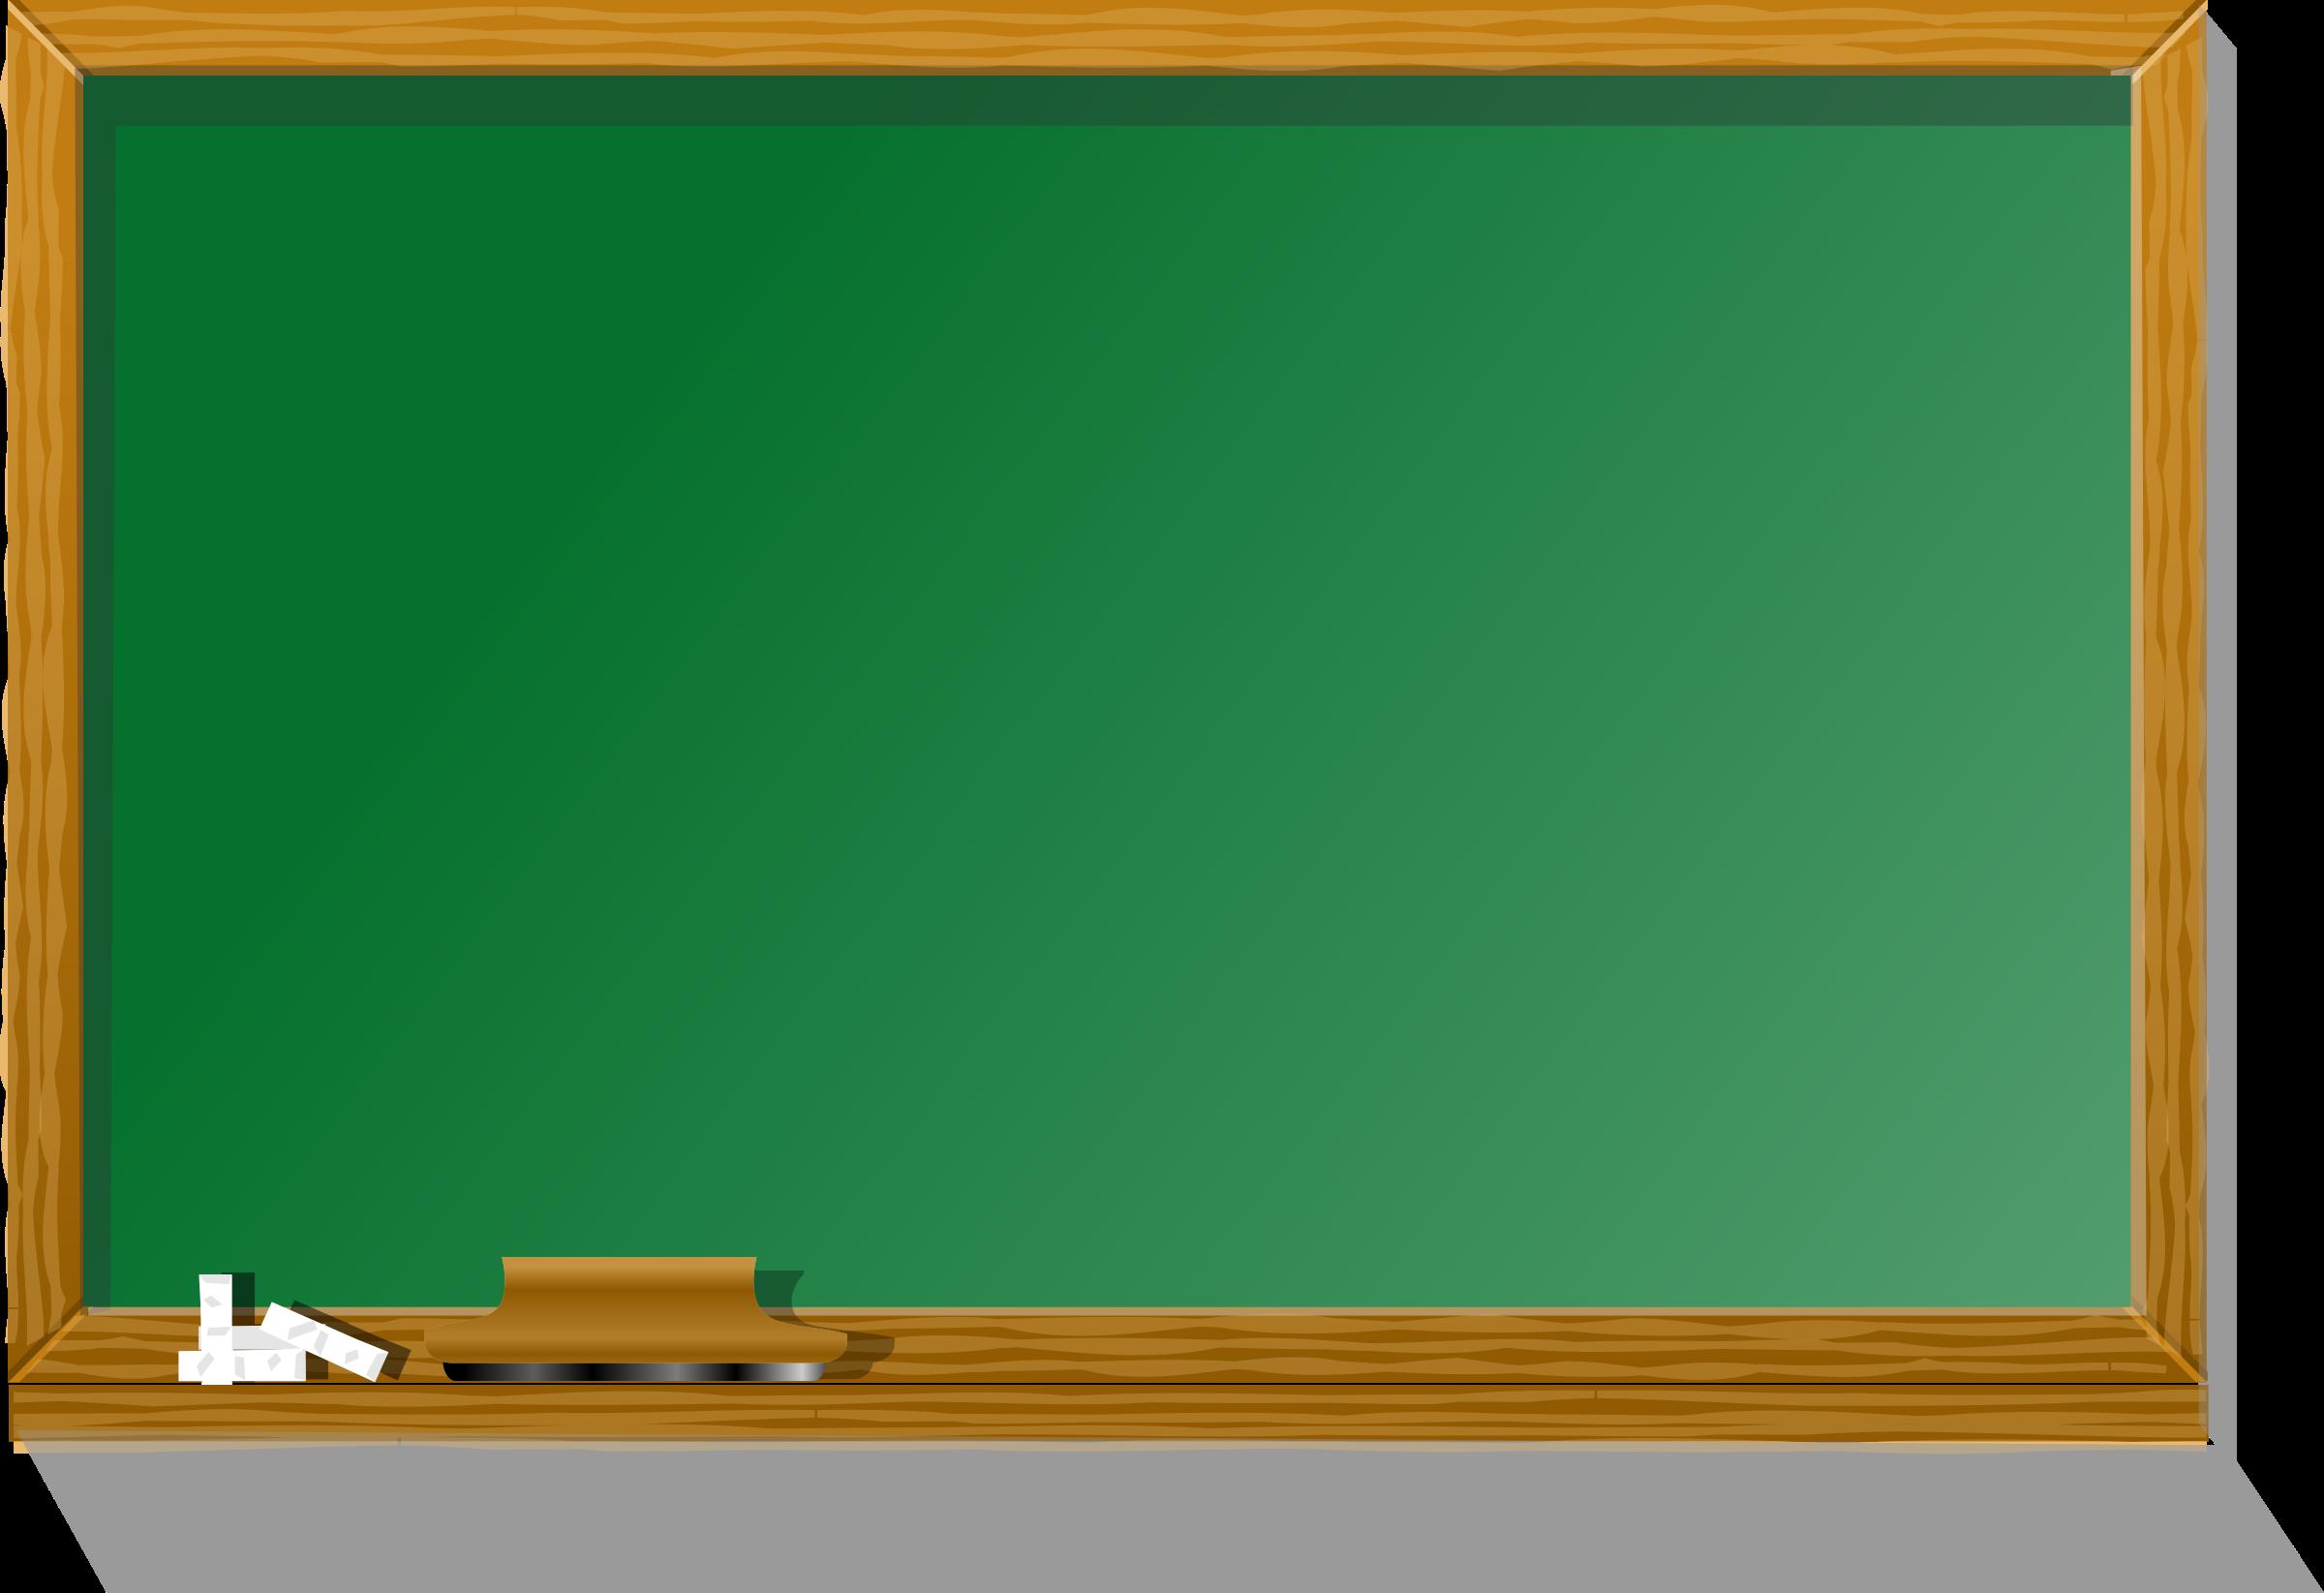 Blackboard clipart. Free download on scubasanmateo